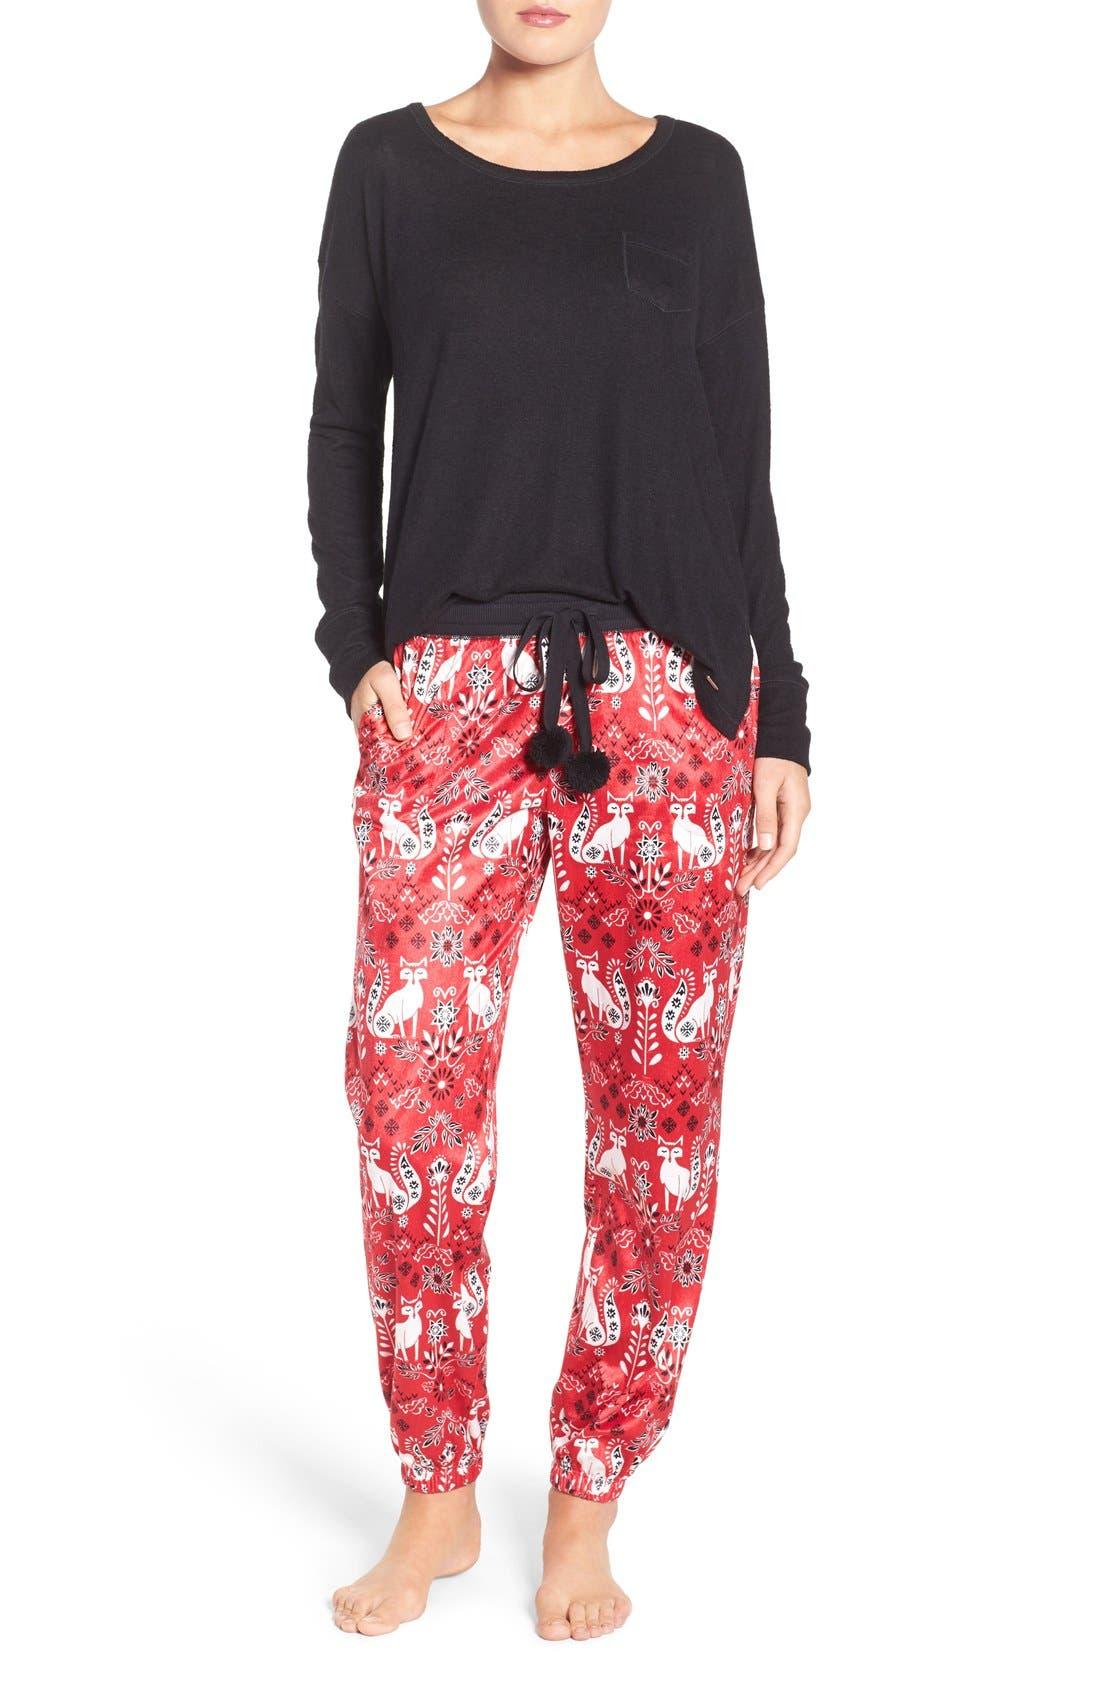 Alternate Image 1 Selected - kensie Long Pajamas & Eye Mask